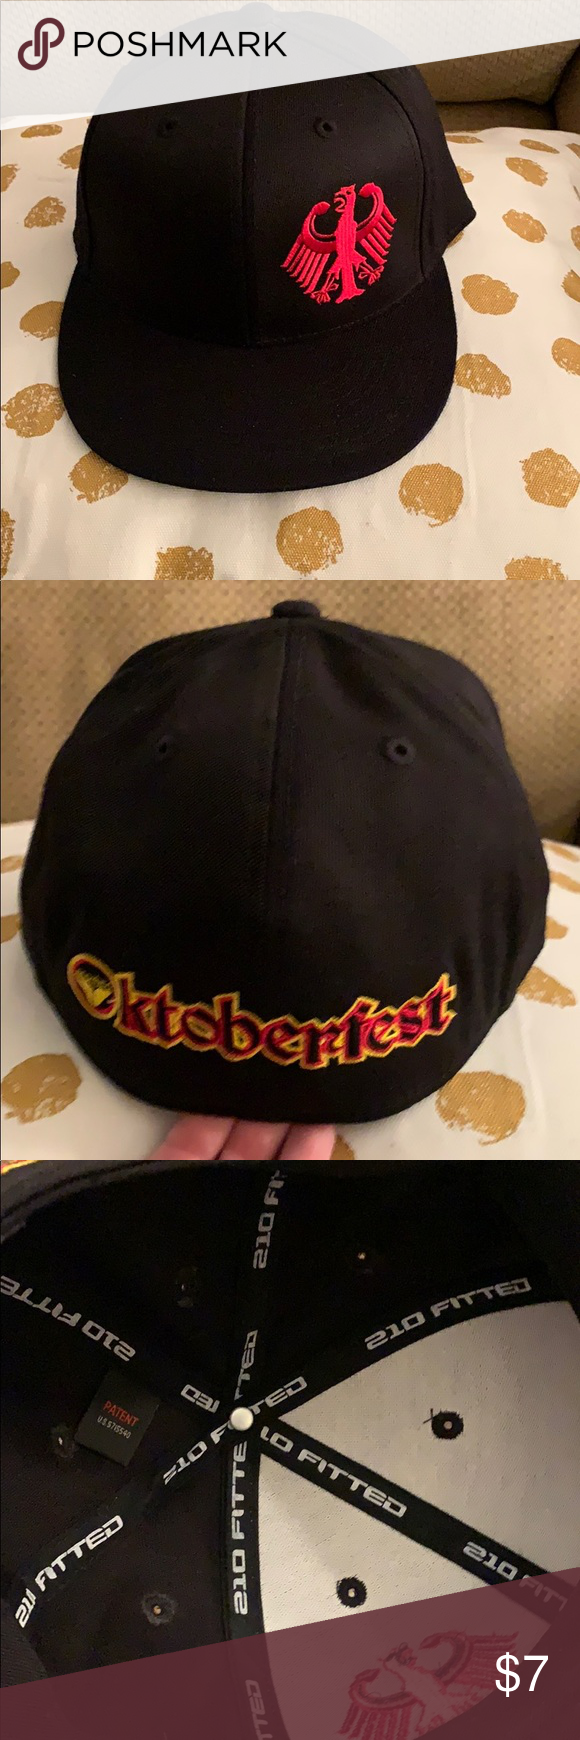 Snowbird Oktoberfest fitted hat Snowbird Oktoberfest fitted hat Accessories  Hats dac155883076